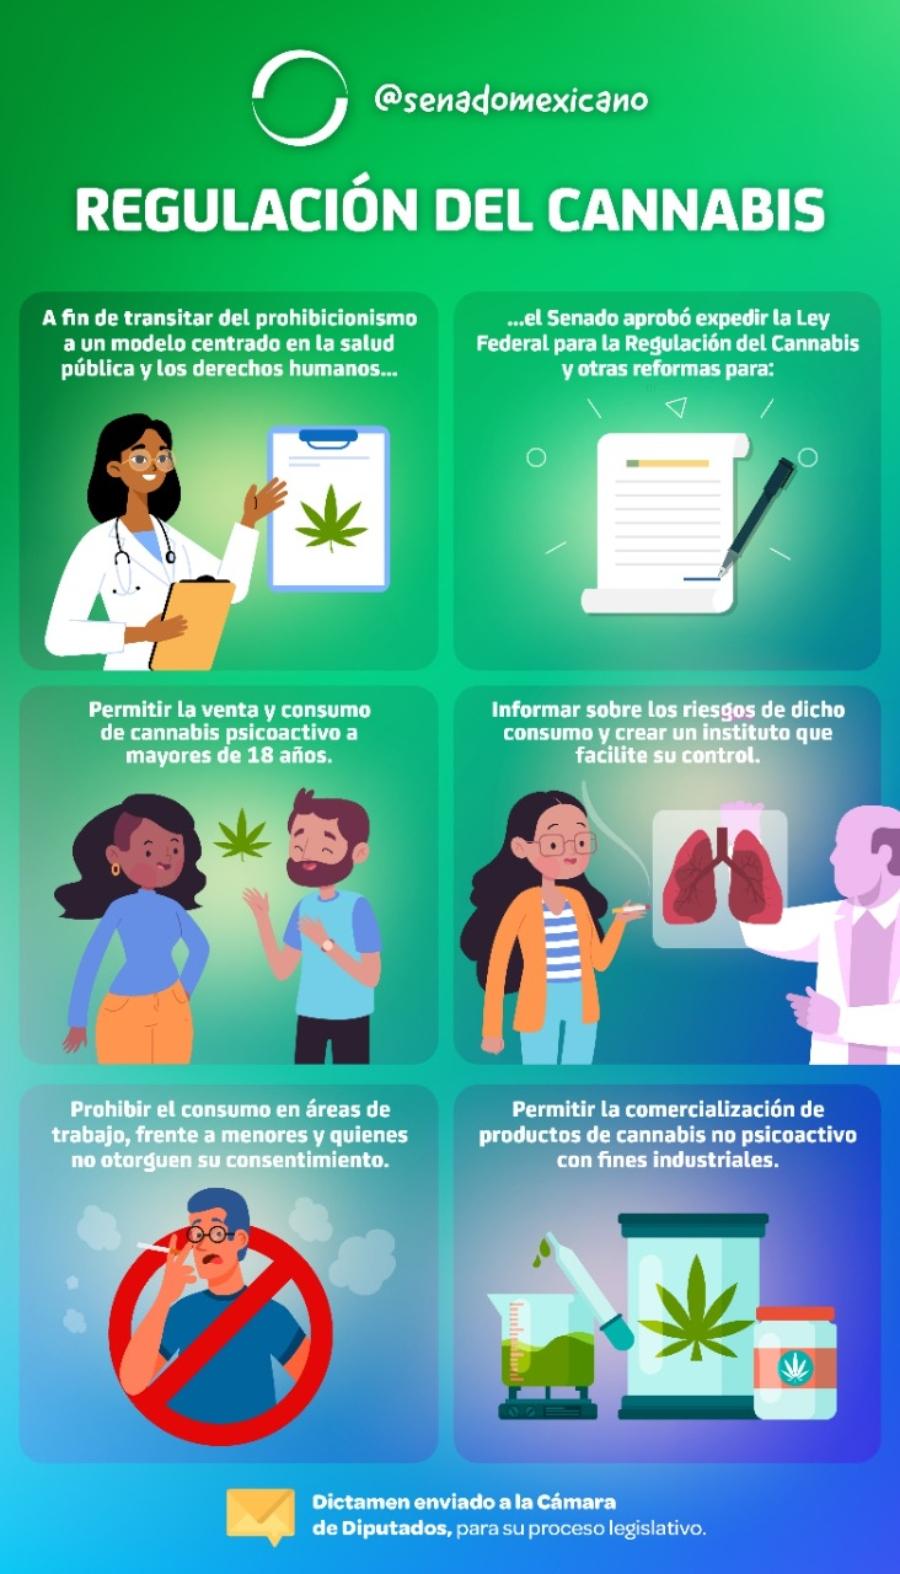 uso adulto de la marihuana en méxico